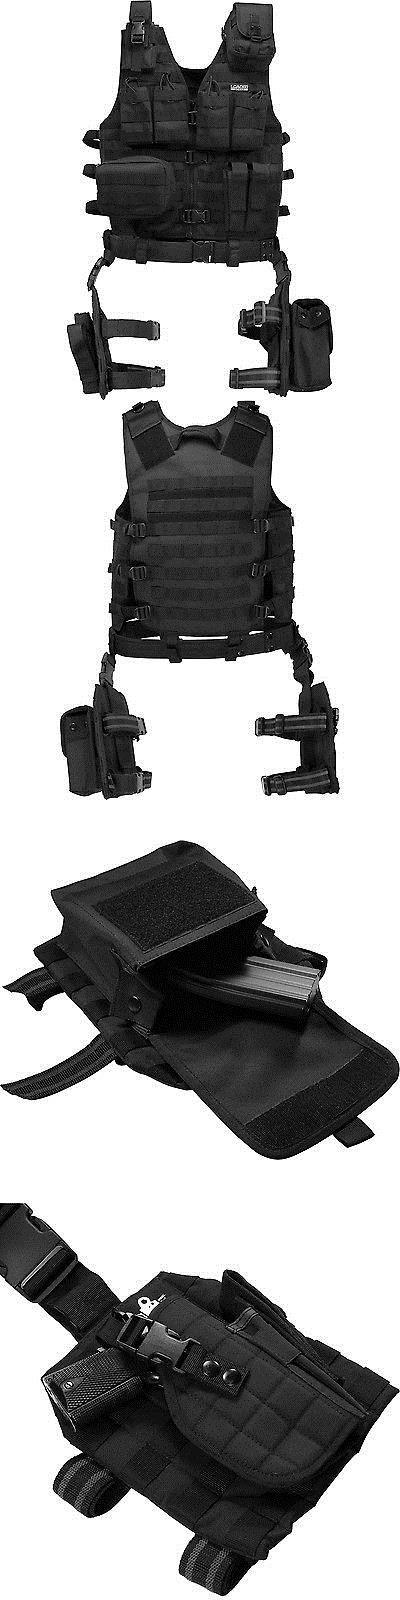 Other Tactical and Duty Gear 177902: Barska Bi12016 Vx-100 Customizable Loaded Gear Black Tactical Vest, Leg Platform -> BUY IT NOW ONLY: $97.99 on eBay!